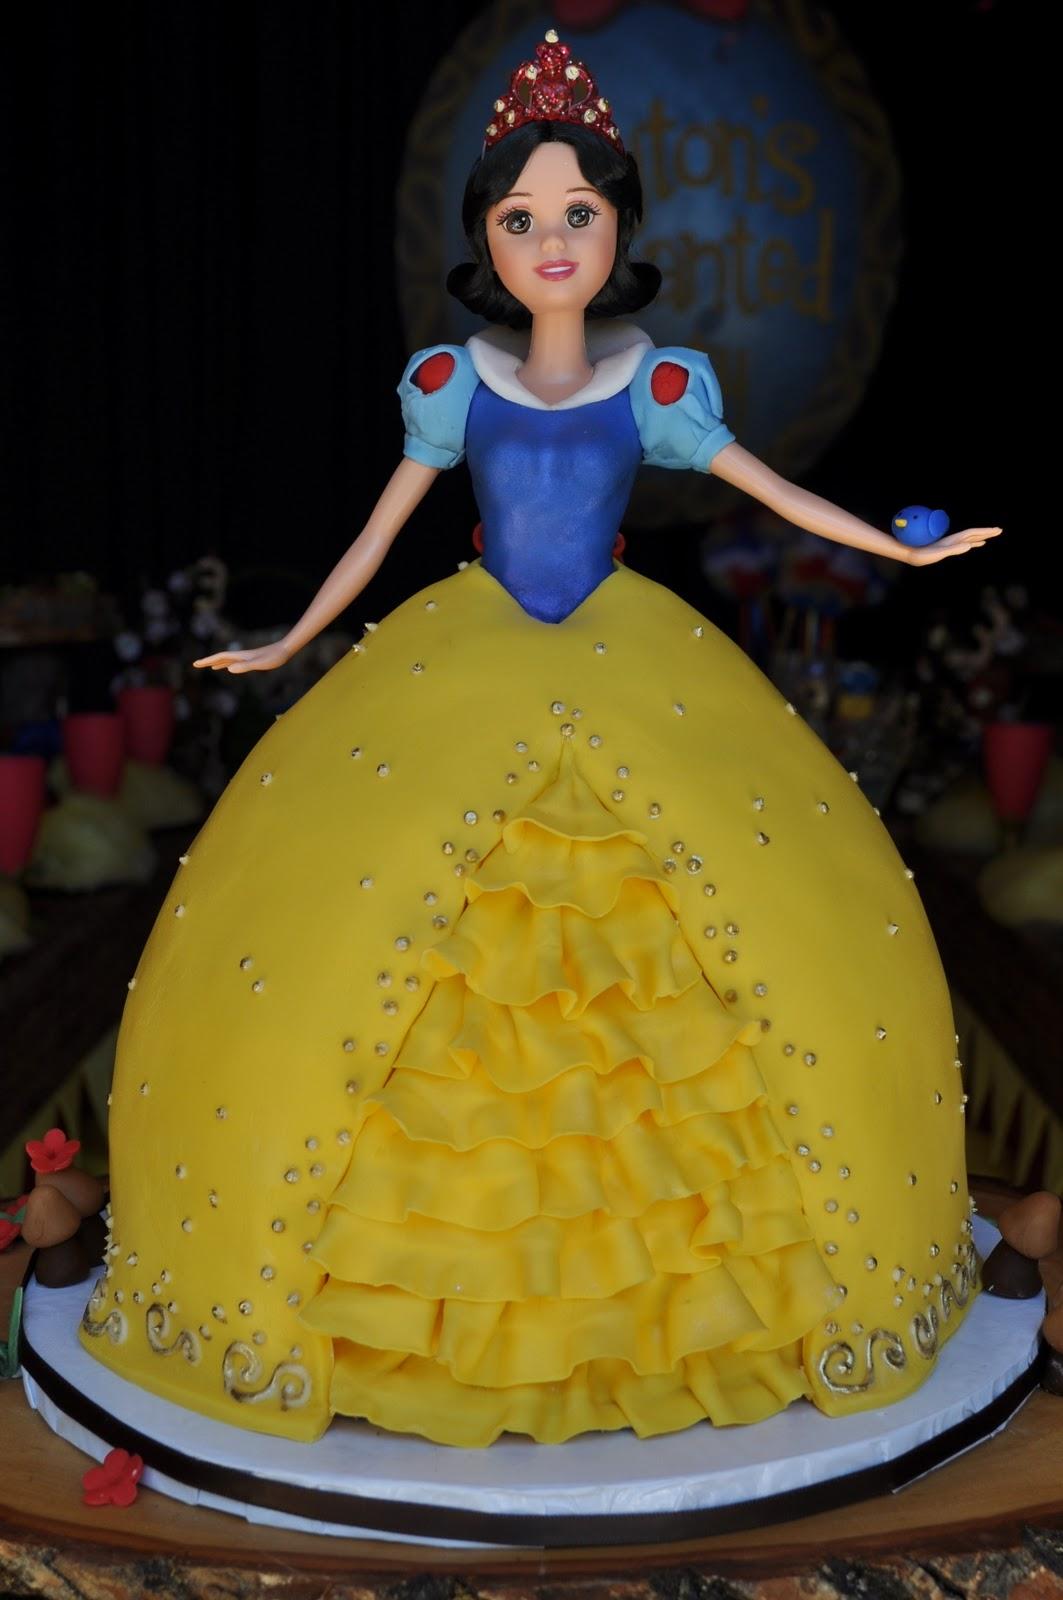 Creating Designer Doll Cakes